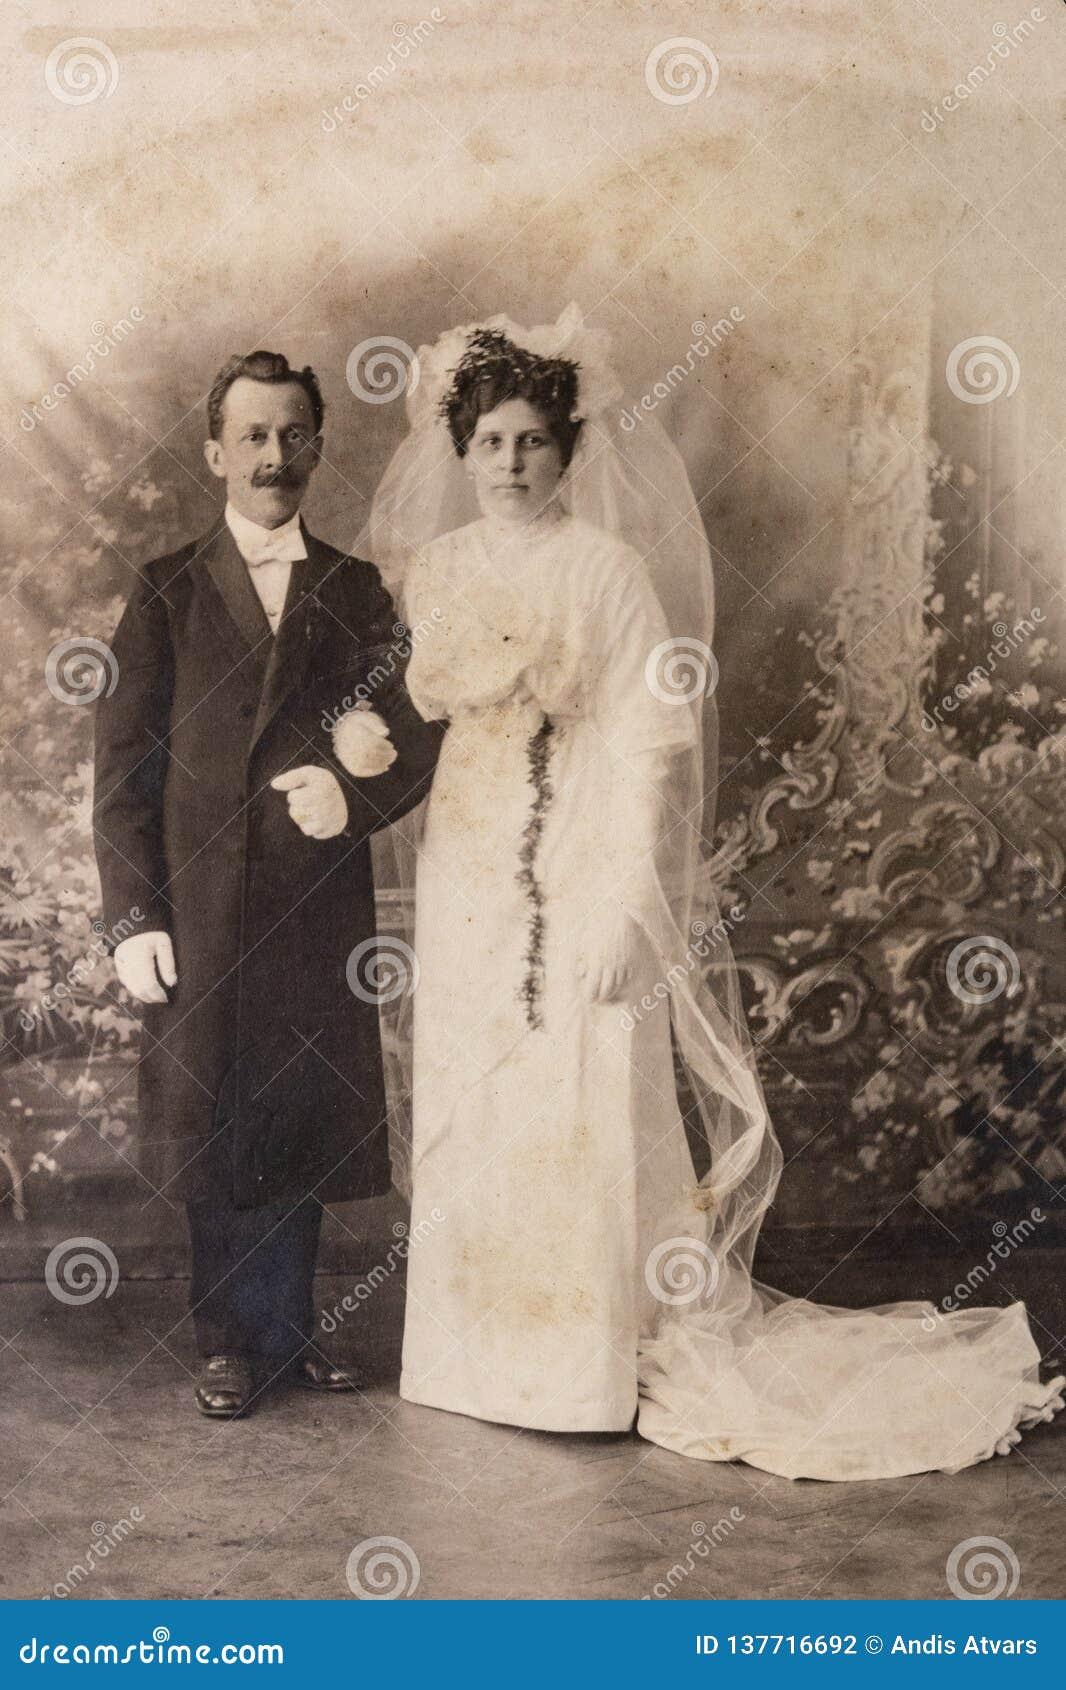 RUSSIA - CIRCA 1905-1910: Wedding shot of just married couple in studio, Vintage Carte de Viste Edwardian era photo